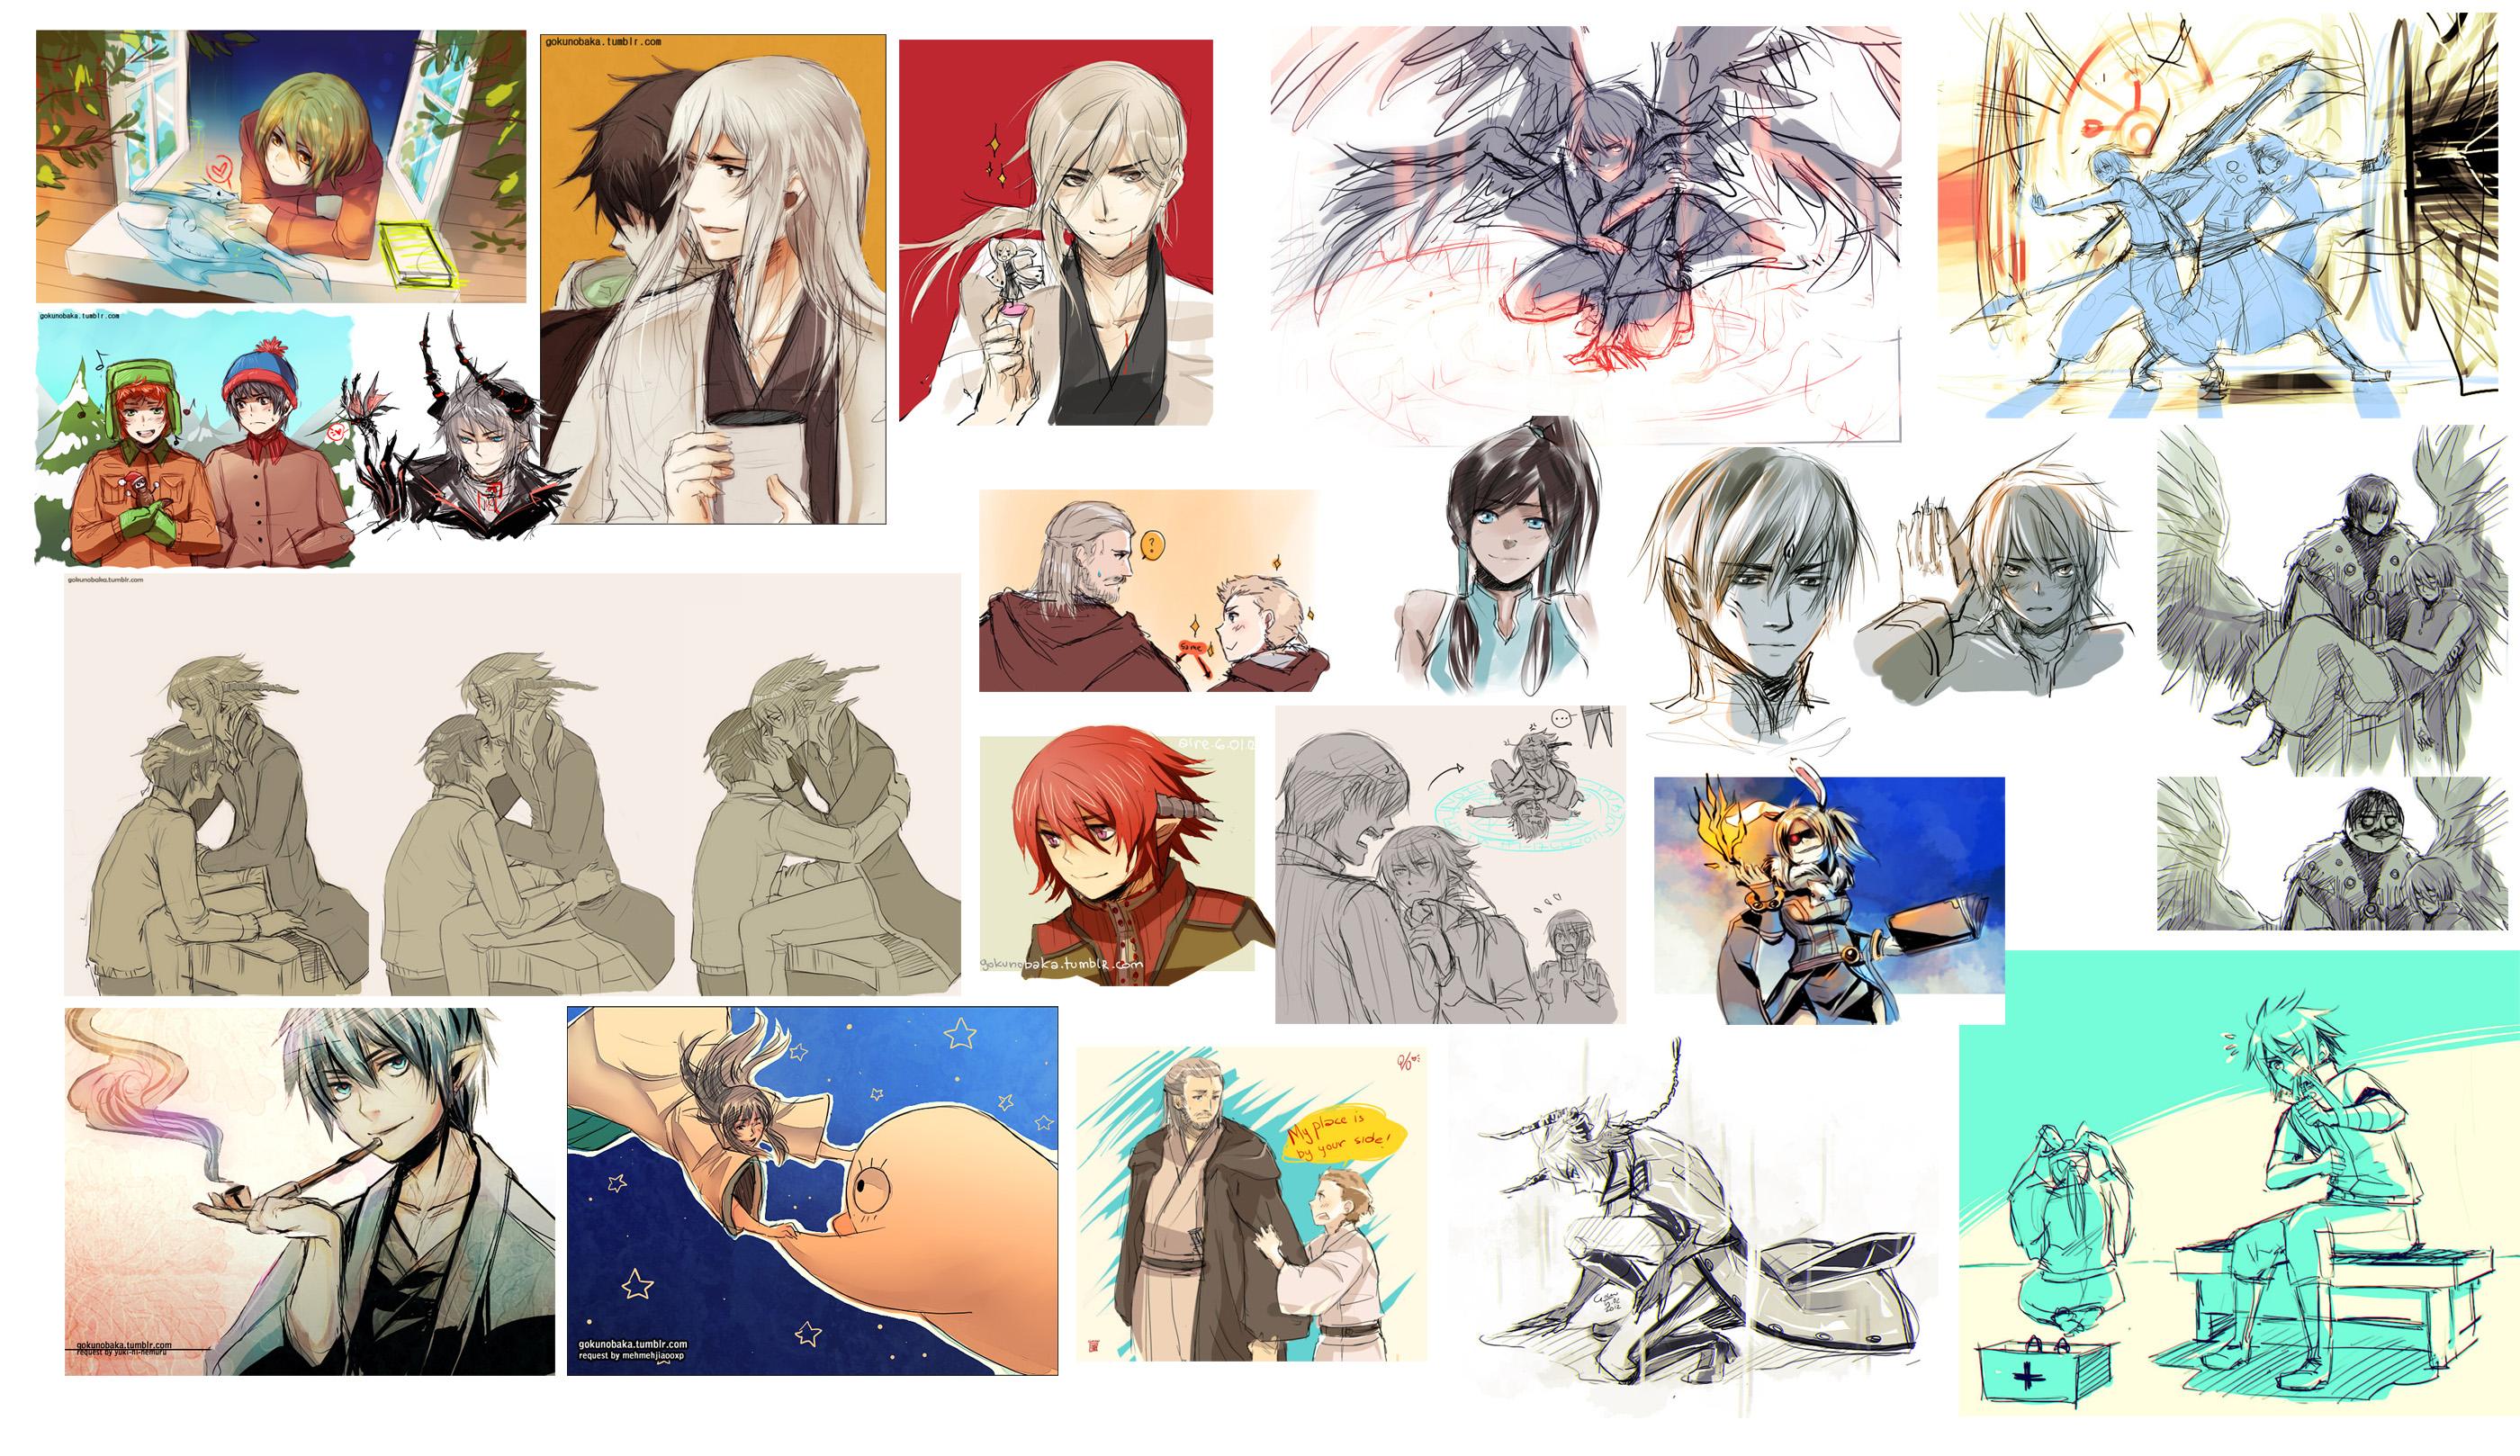 Skydoesminecraft Fan Art Tumblr Oc And Fanart Dump By Iruka Loves Kakashi